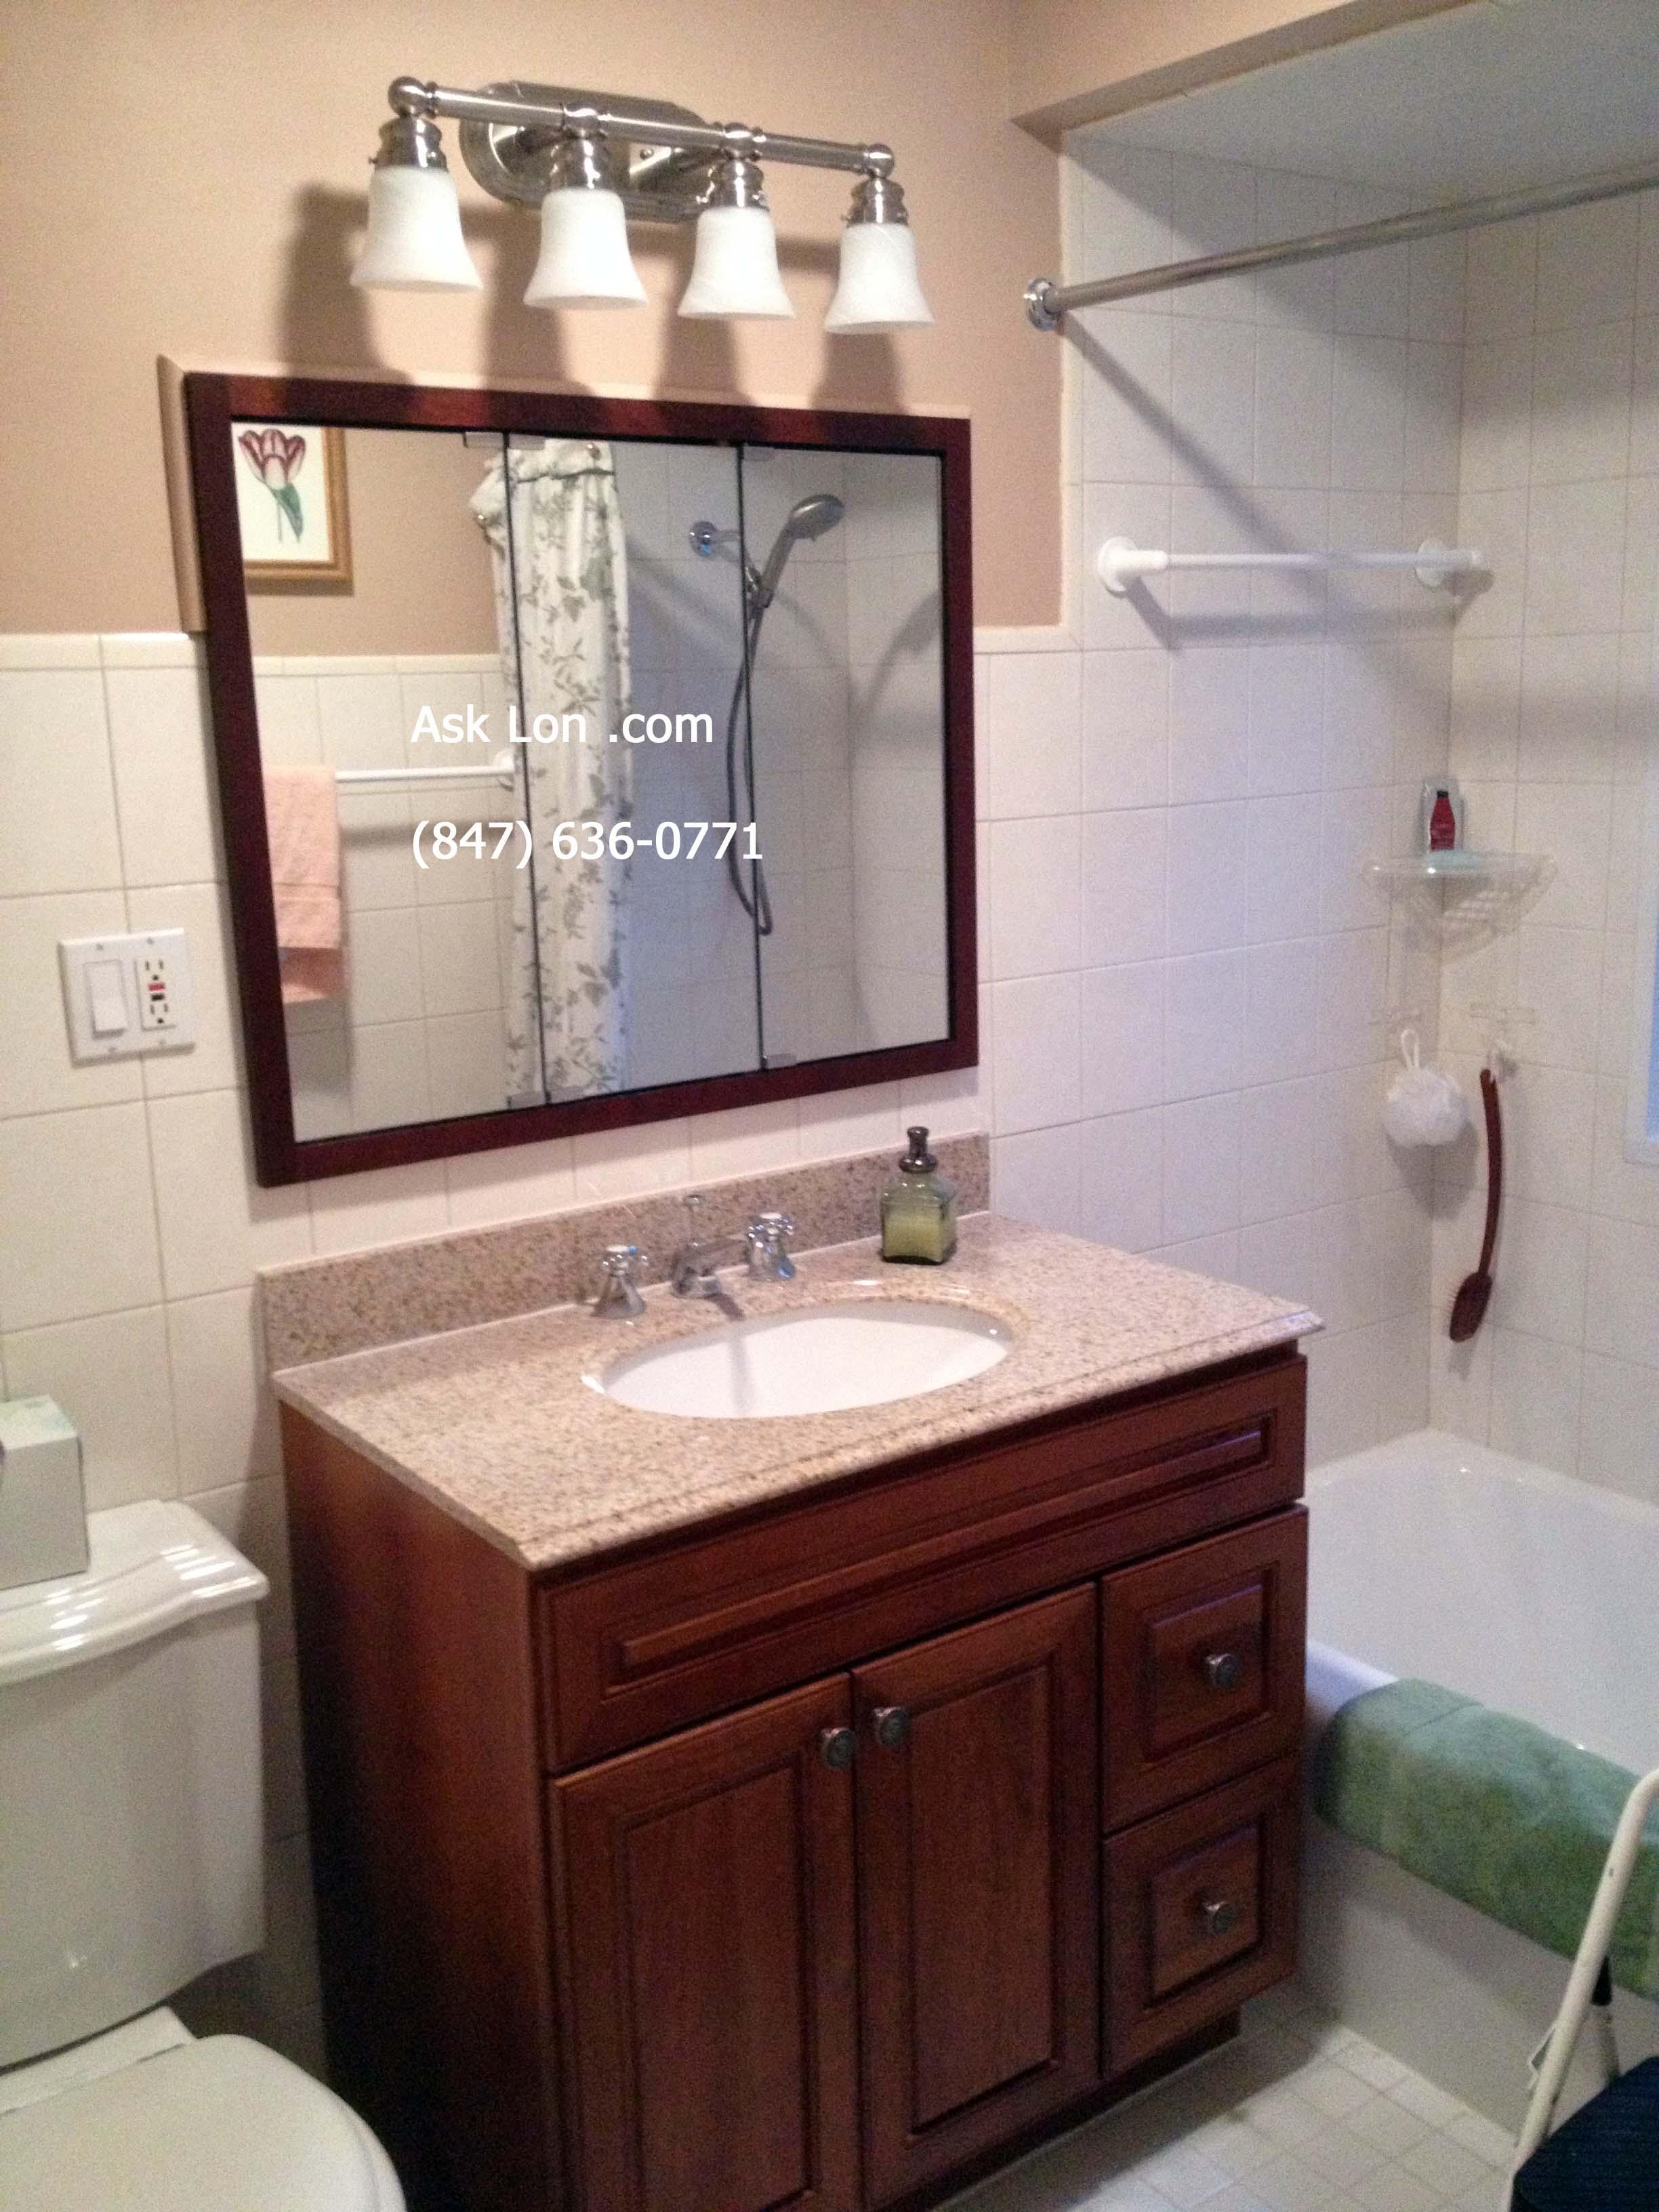 Bathroom : Extraordinary Bathroom Vanity Mirrors Extraordinary Pertaining To Bathroom Vanity Mirrors (Image 2 of 20)